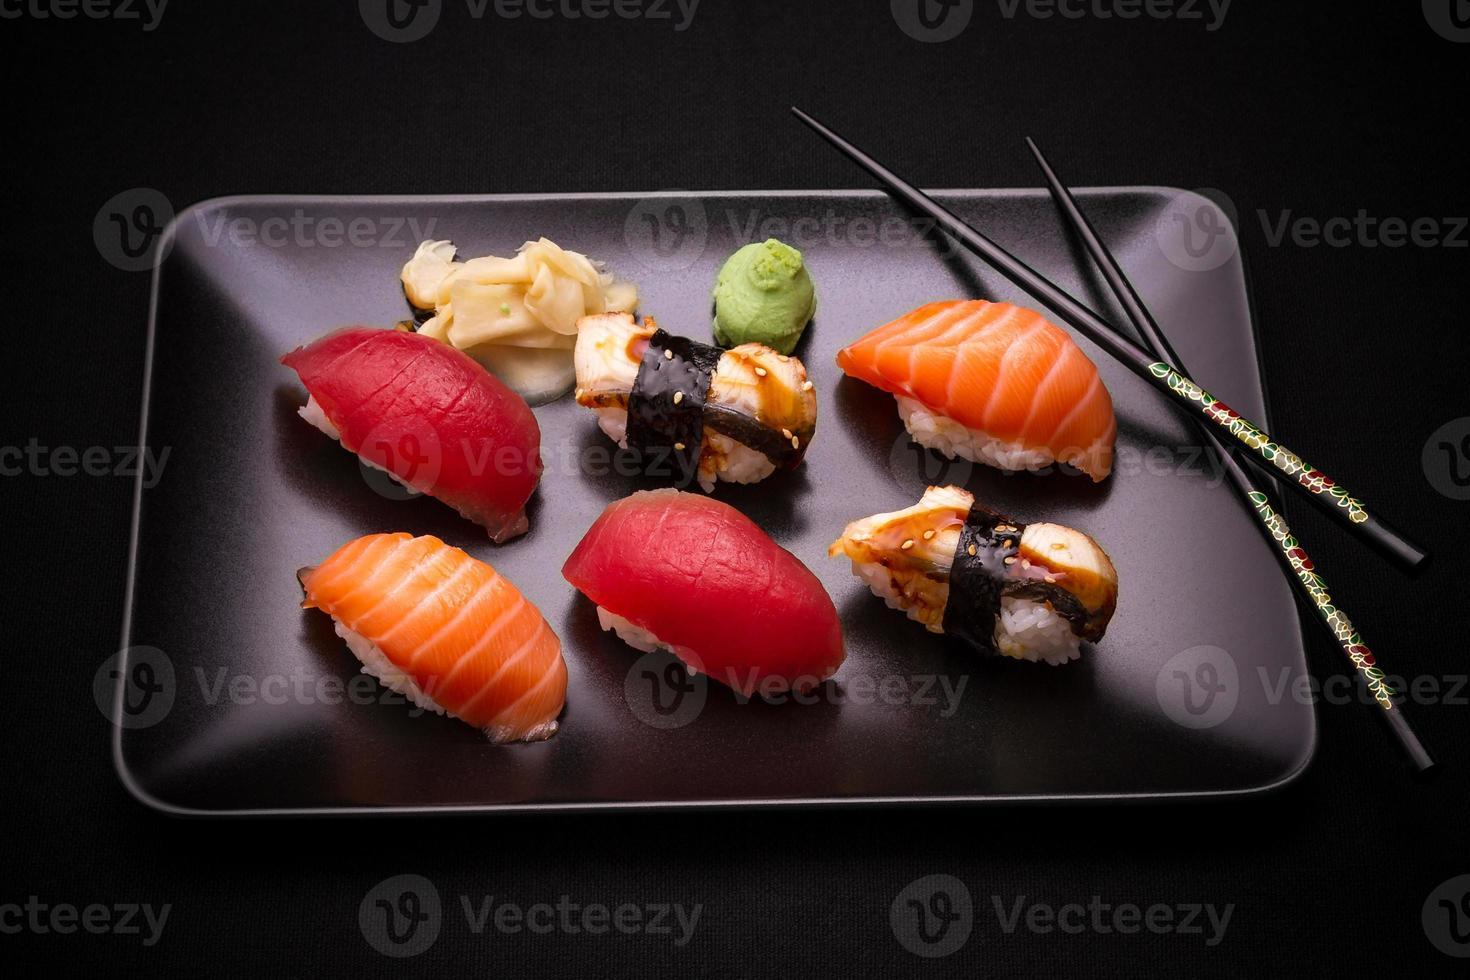 paling, zalm en tonijn sushi met stokjes foto